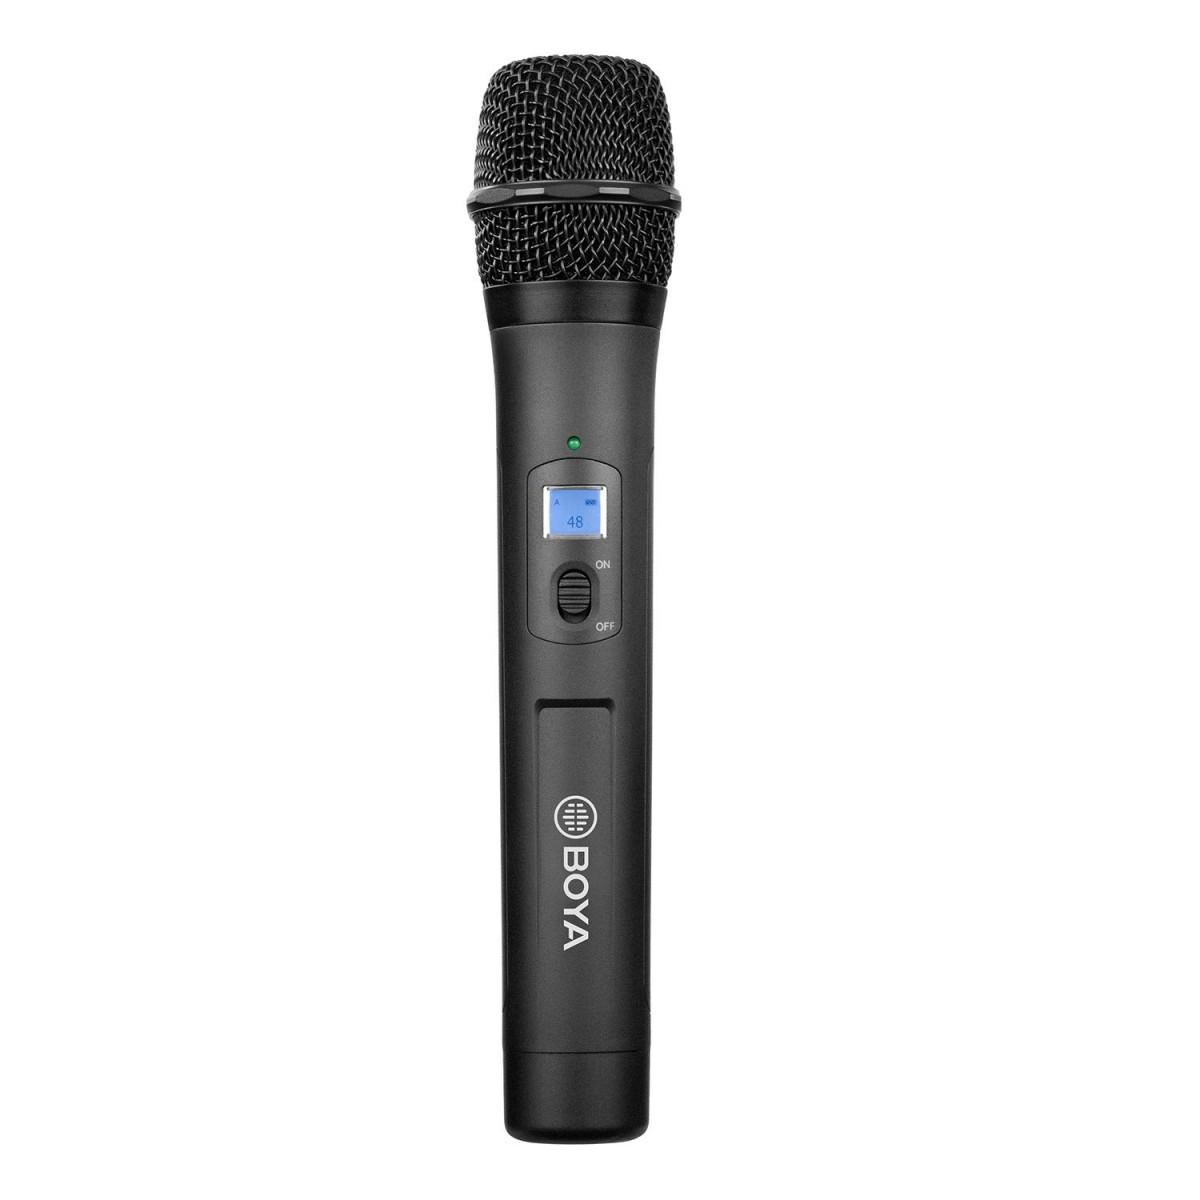 boya-by-whm8-48-channel-uhf-wireless-dynamic-handheld-microphone-transmitter